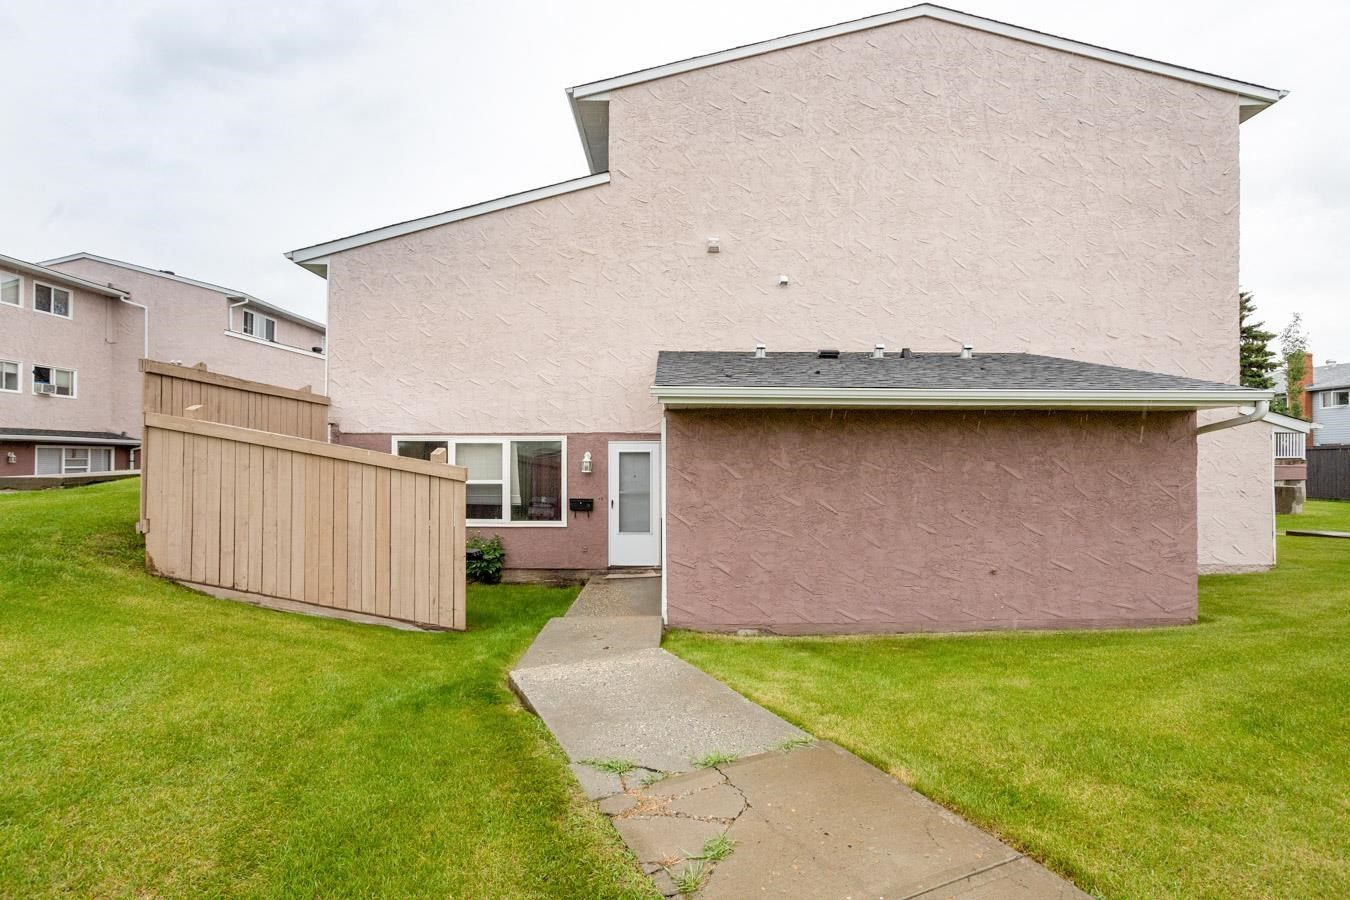 Main Photo: 9 13570 38 Street in Edmonton: Zone 35 Townhouse for sale : MLS®# E4249096